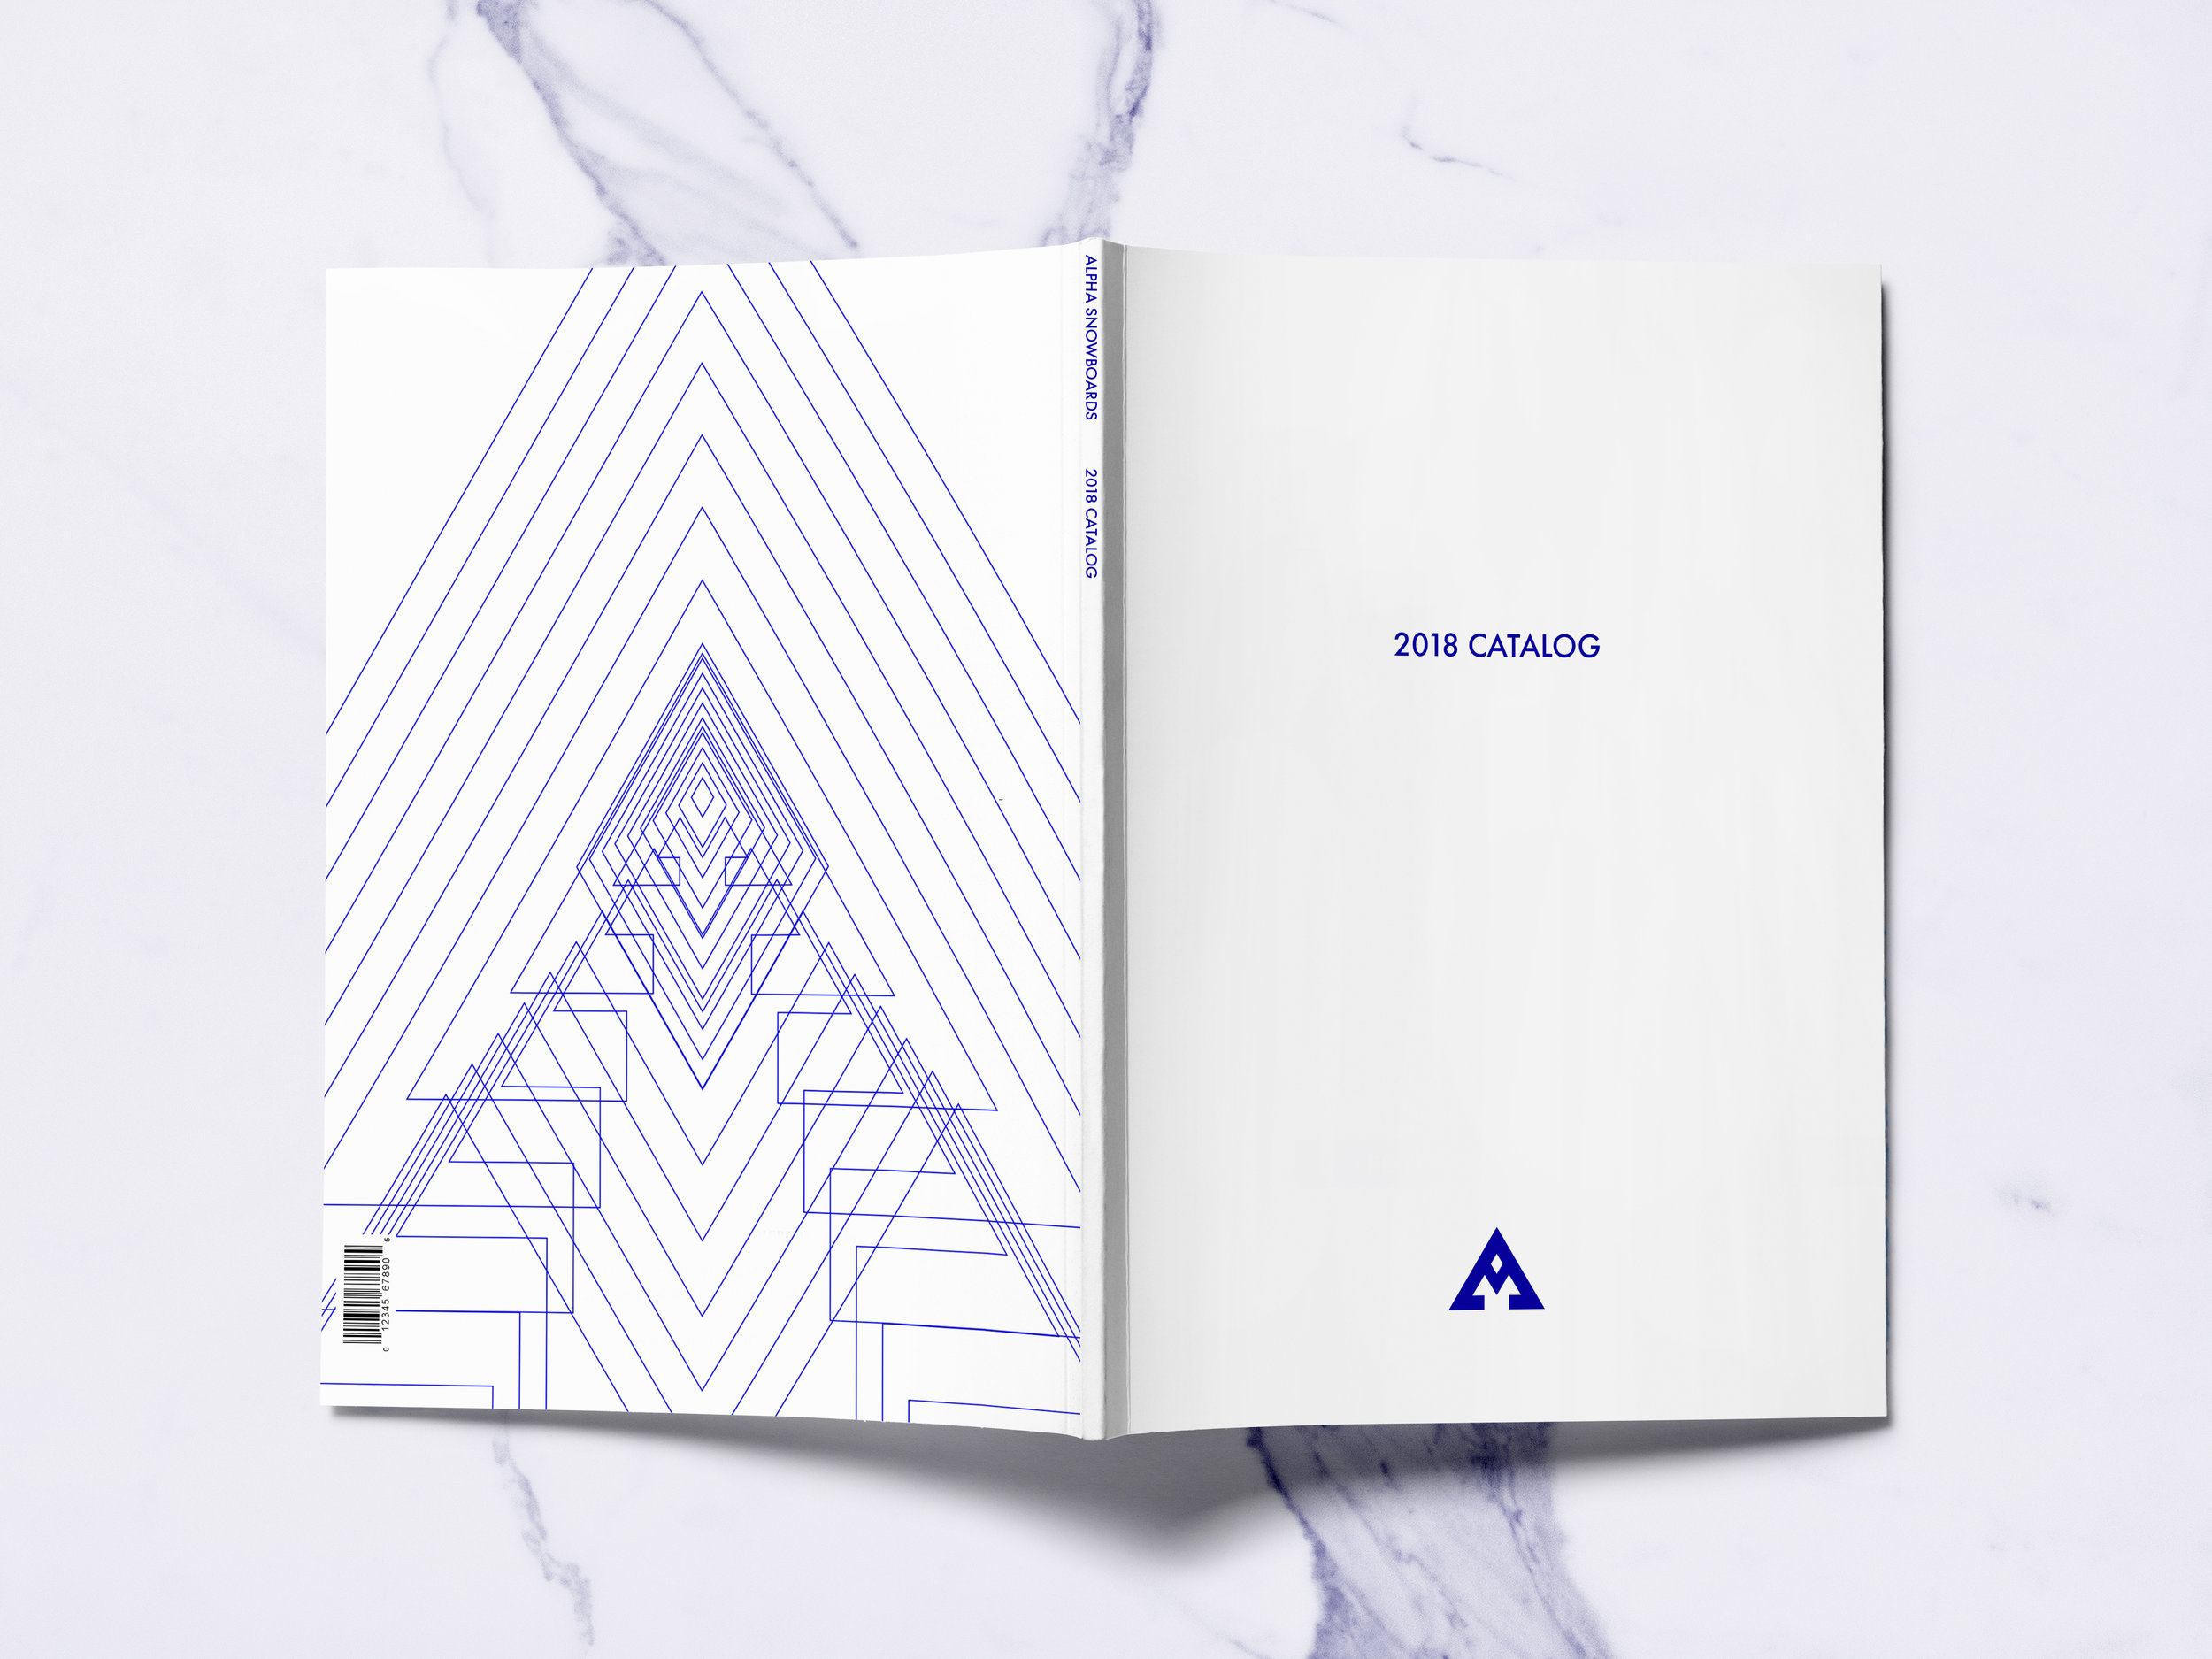 2018 catalog1.jpg